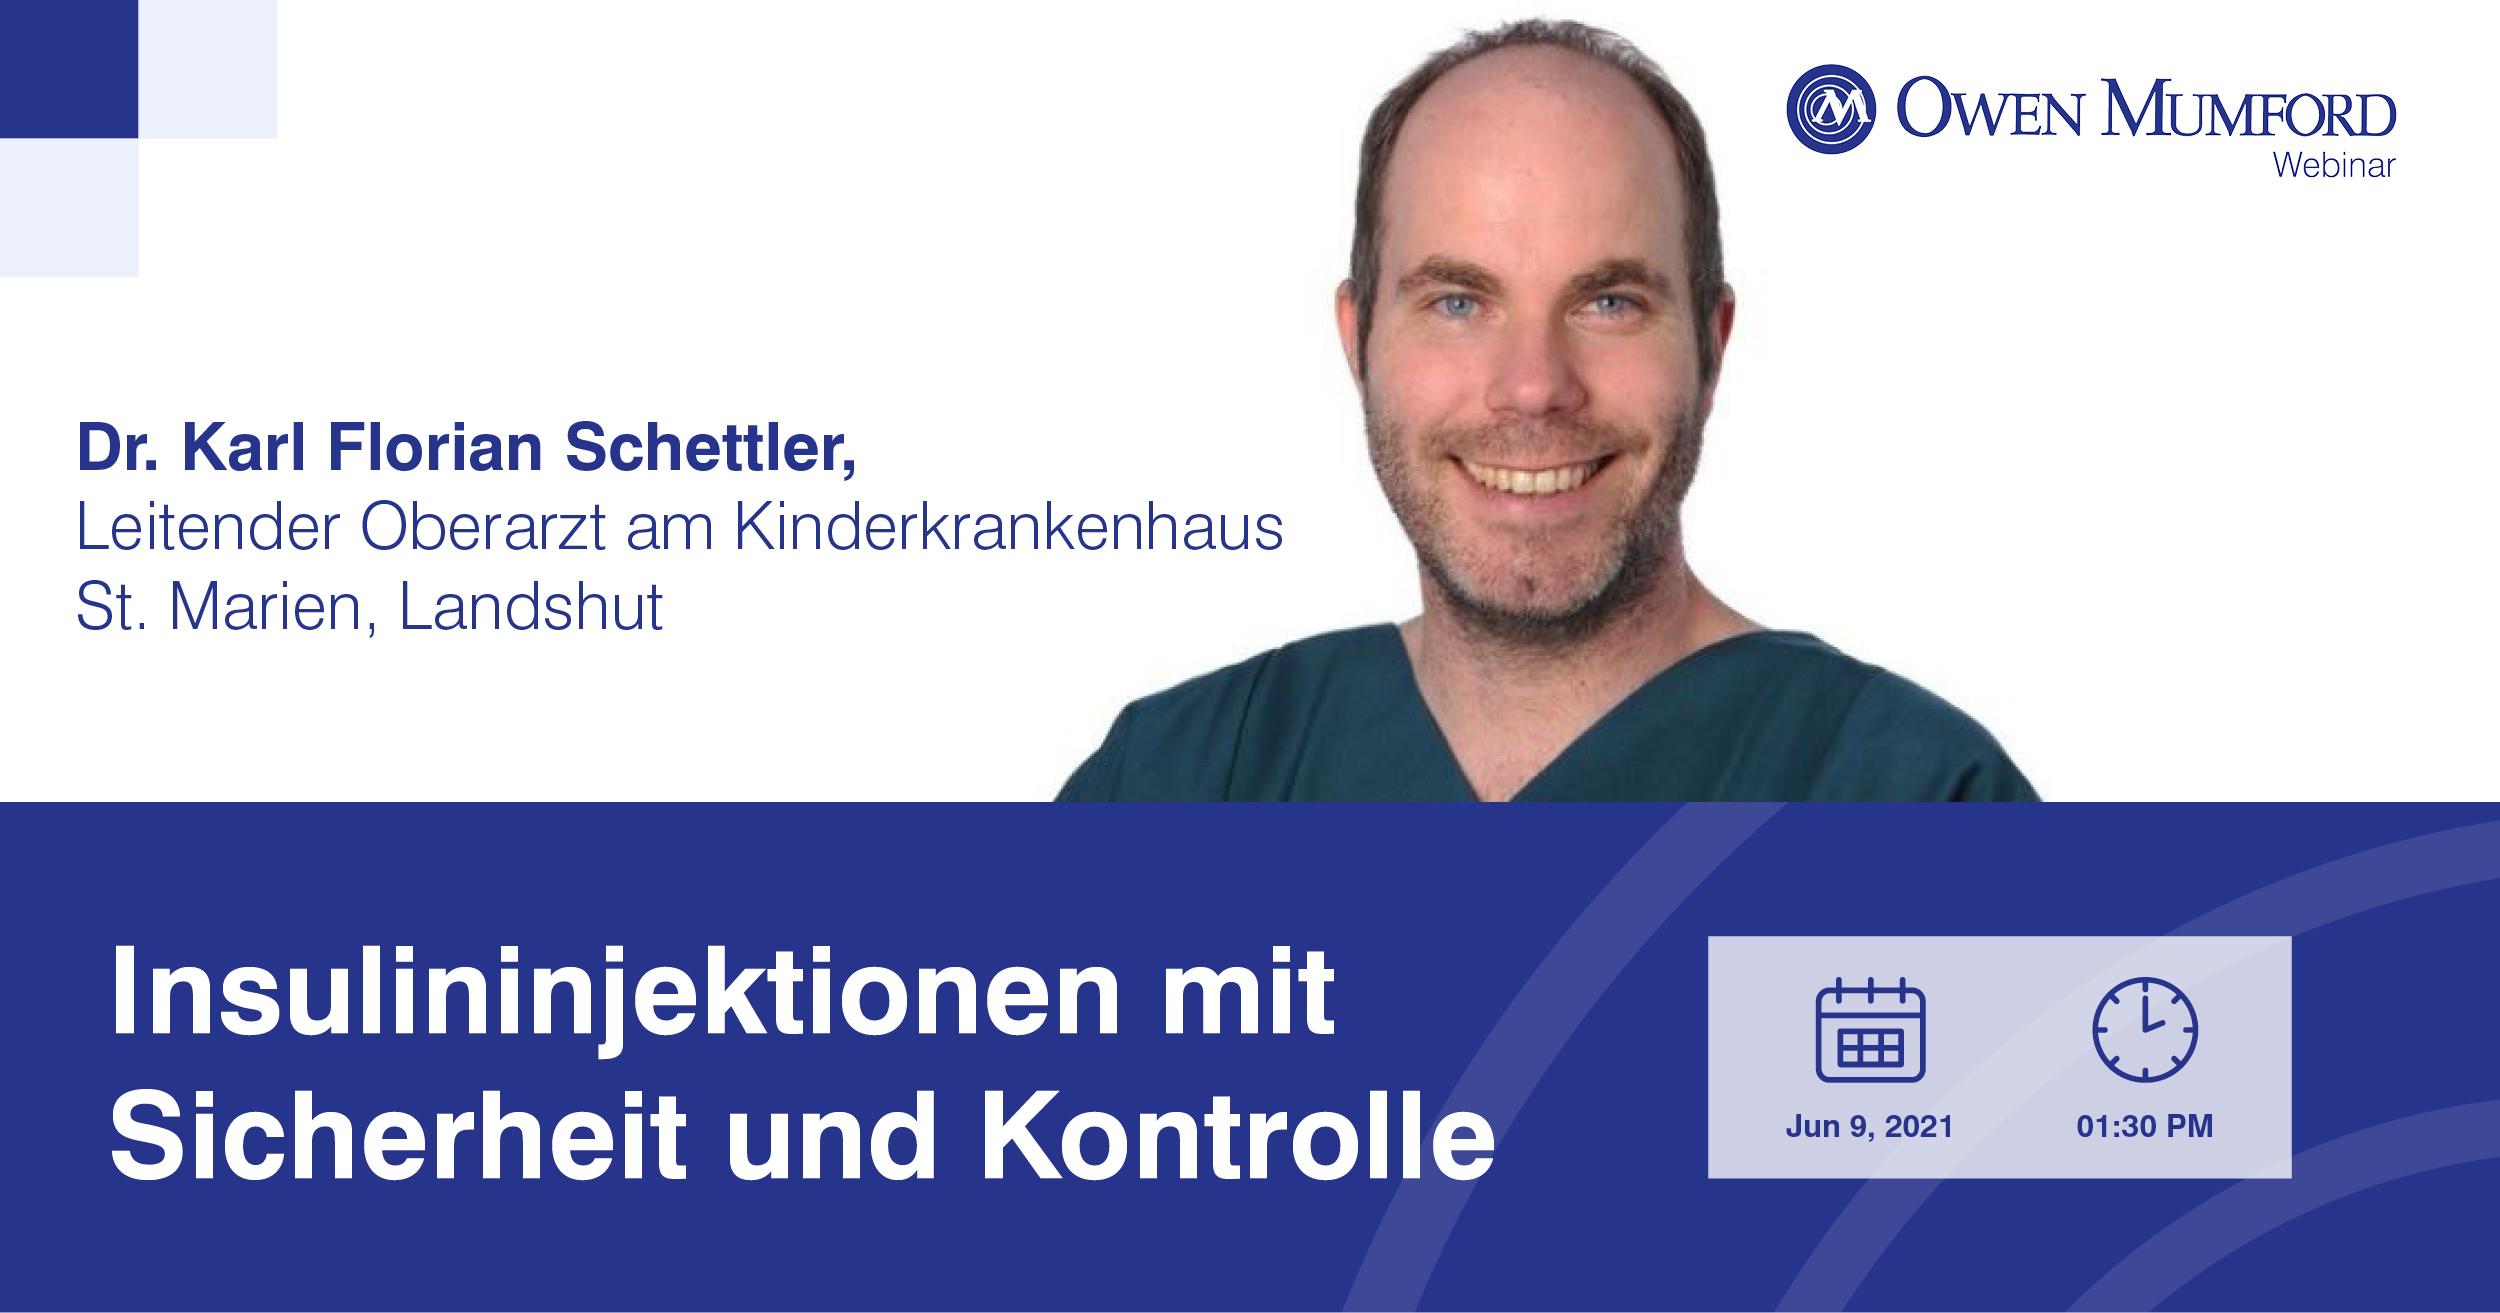 Webinar mit Dr. Karl Florian Schettler am 09.Juni 2021